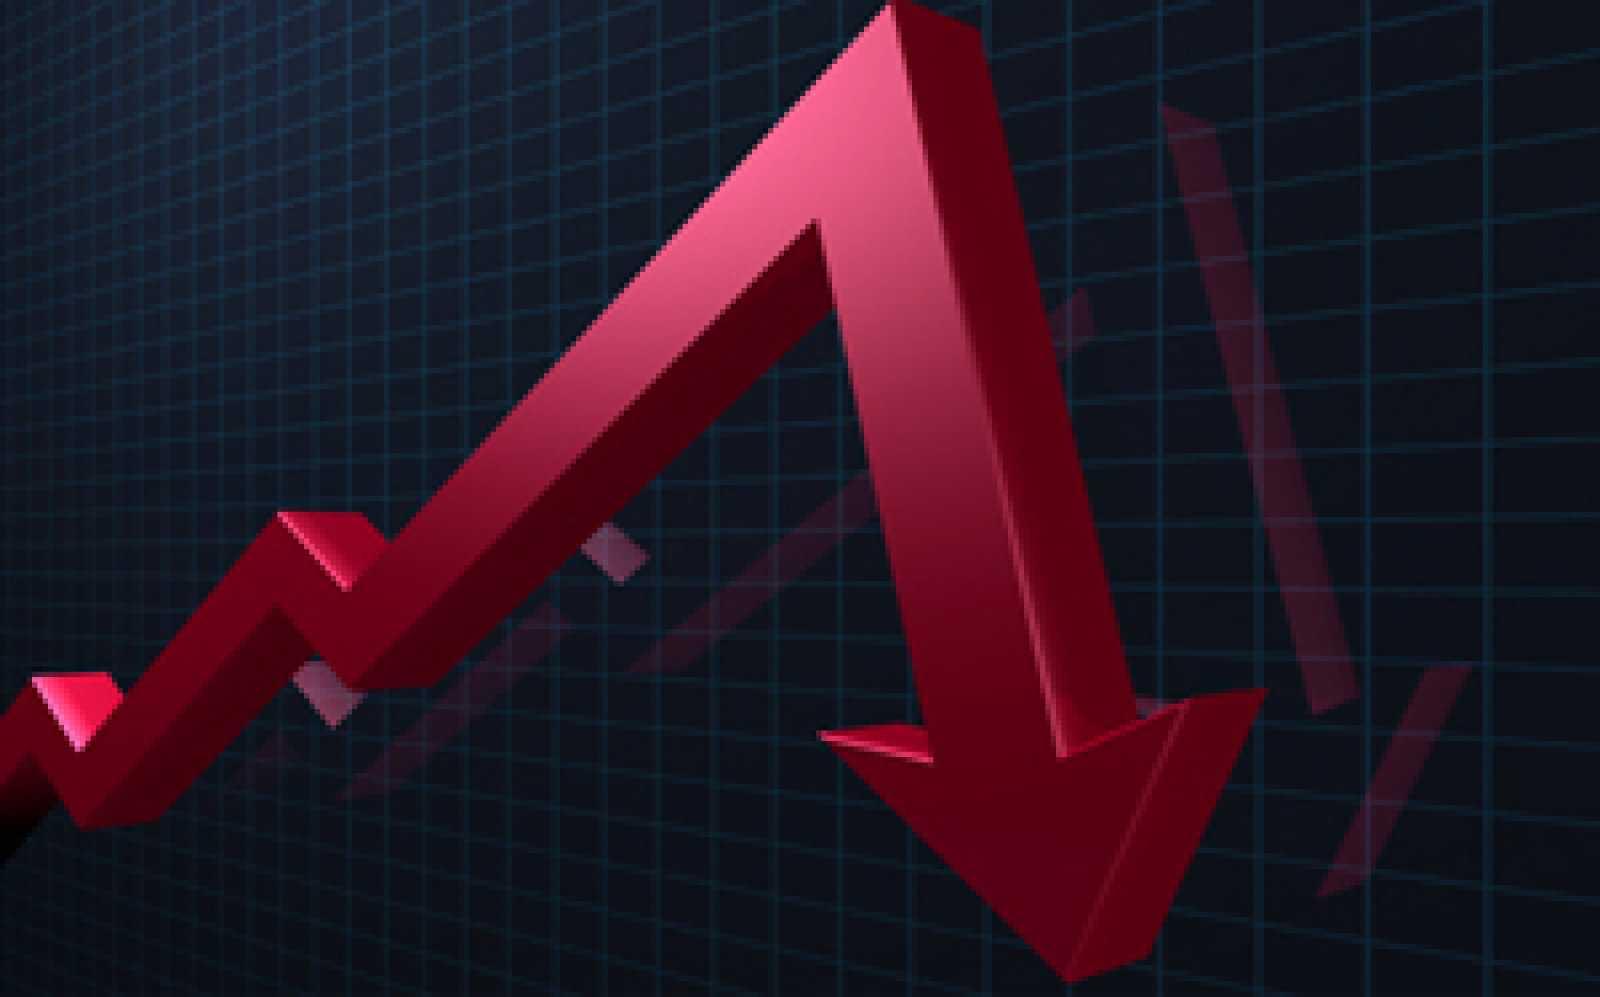 Оборот общепита Петербурга упал на 30,5%: кто виноват?